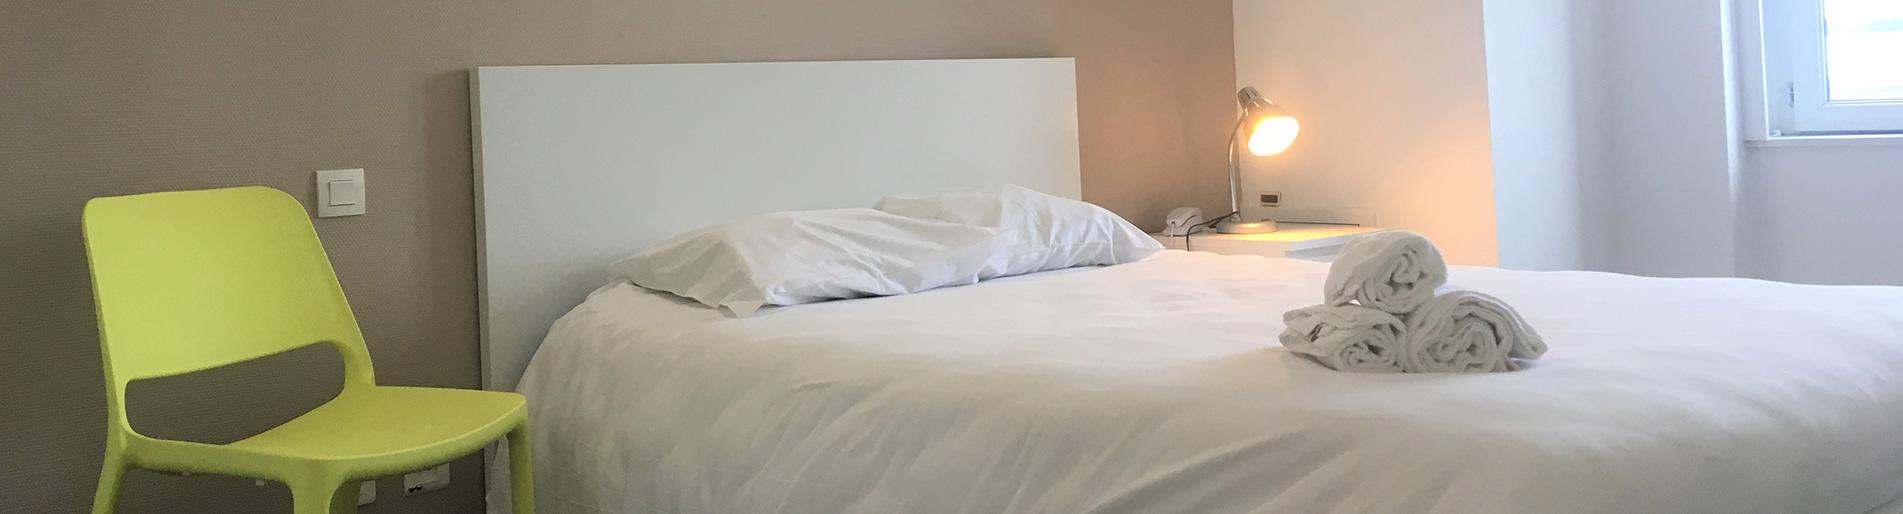 Hospi hotel